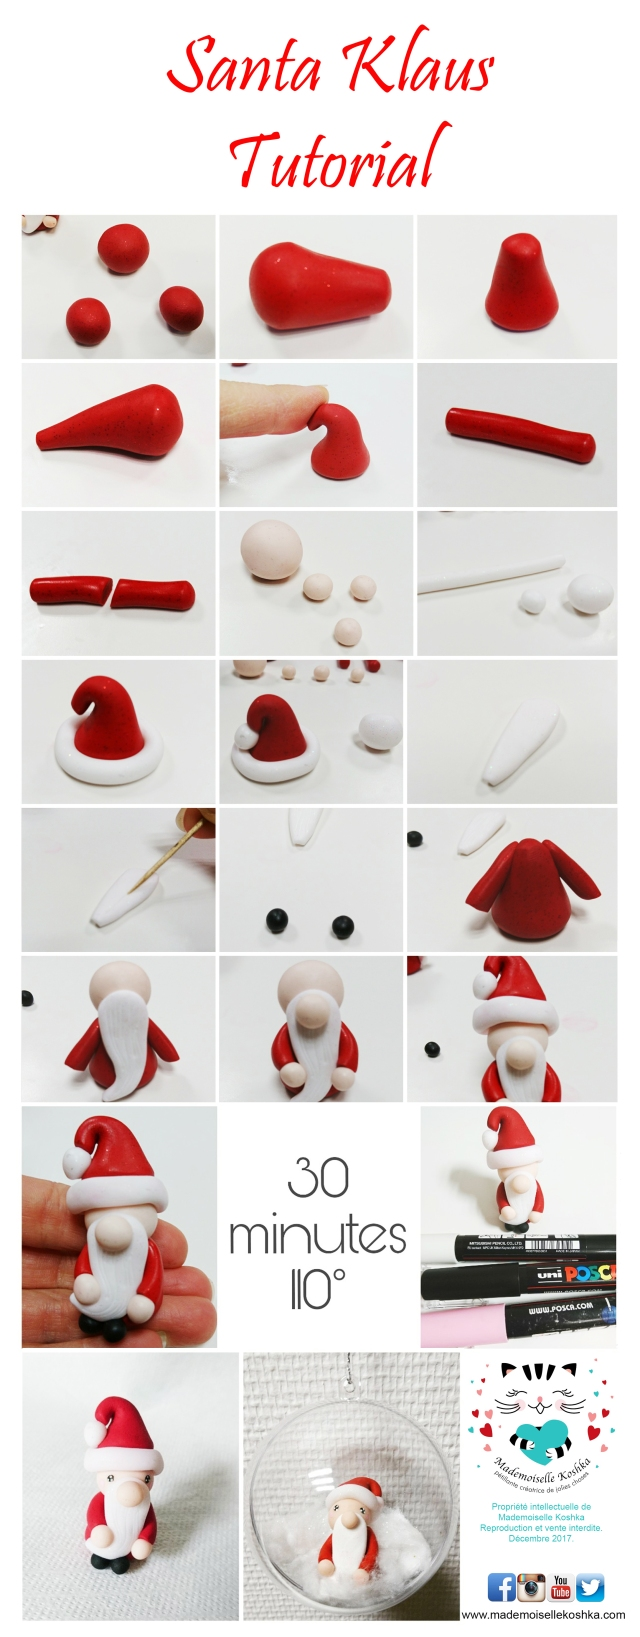 Santa Klaus Tutorial